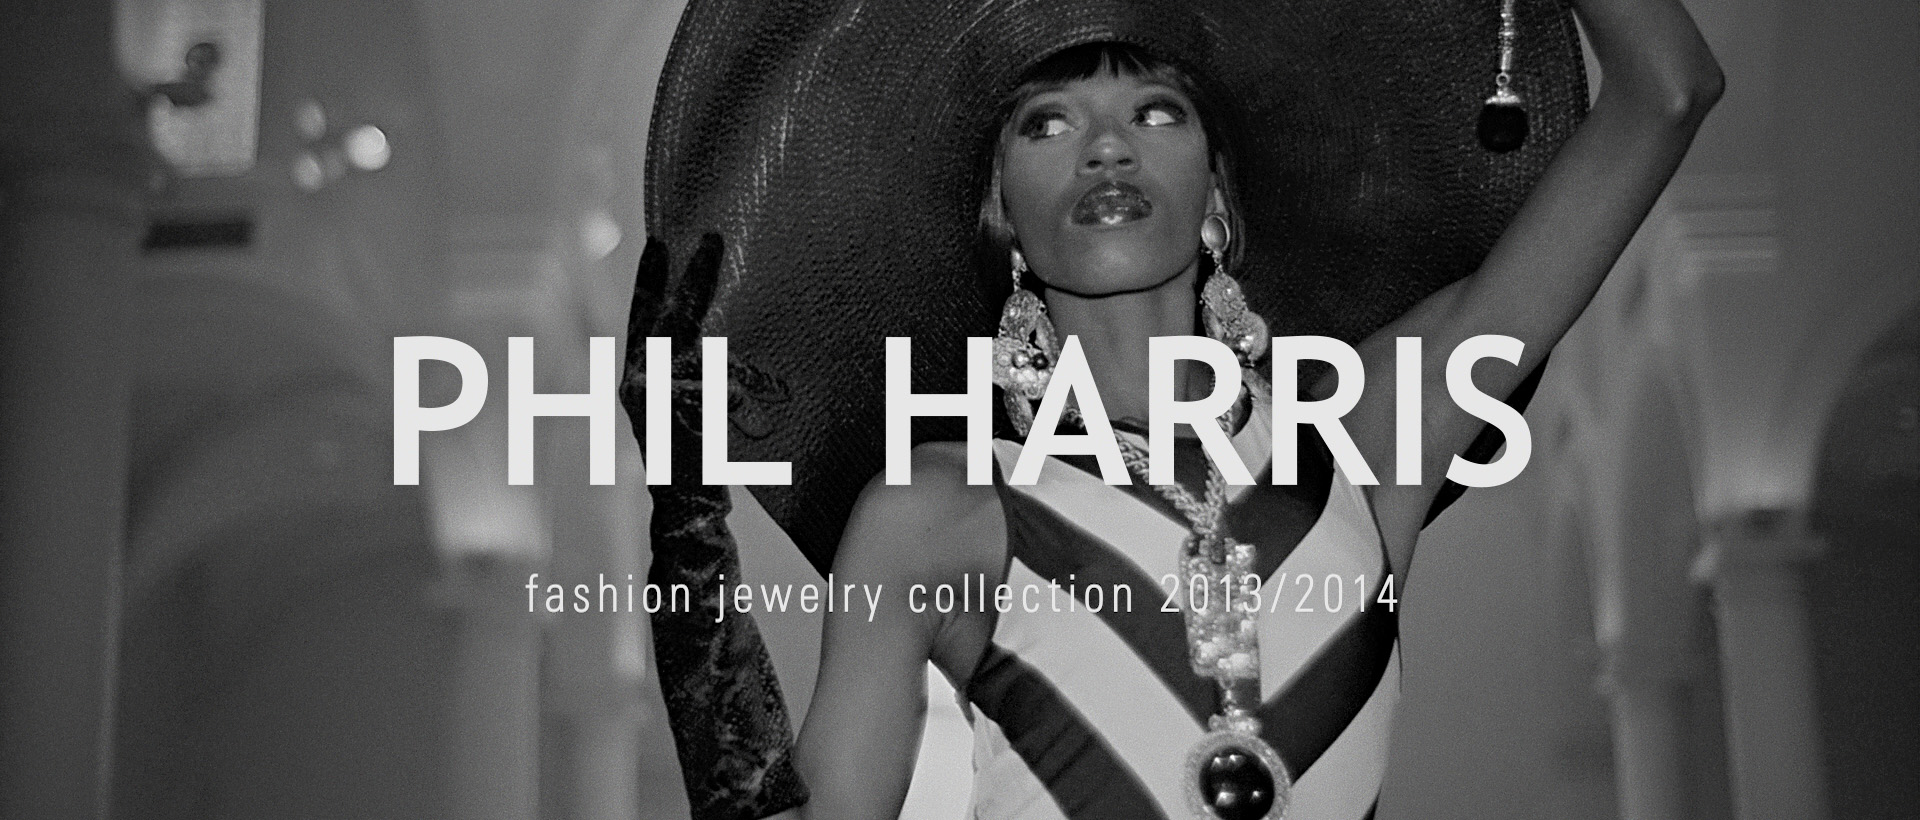 Phil_Harris_Fashion_Show_by_Stanley_Hsu.jpg